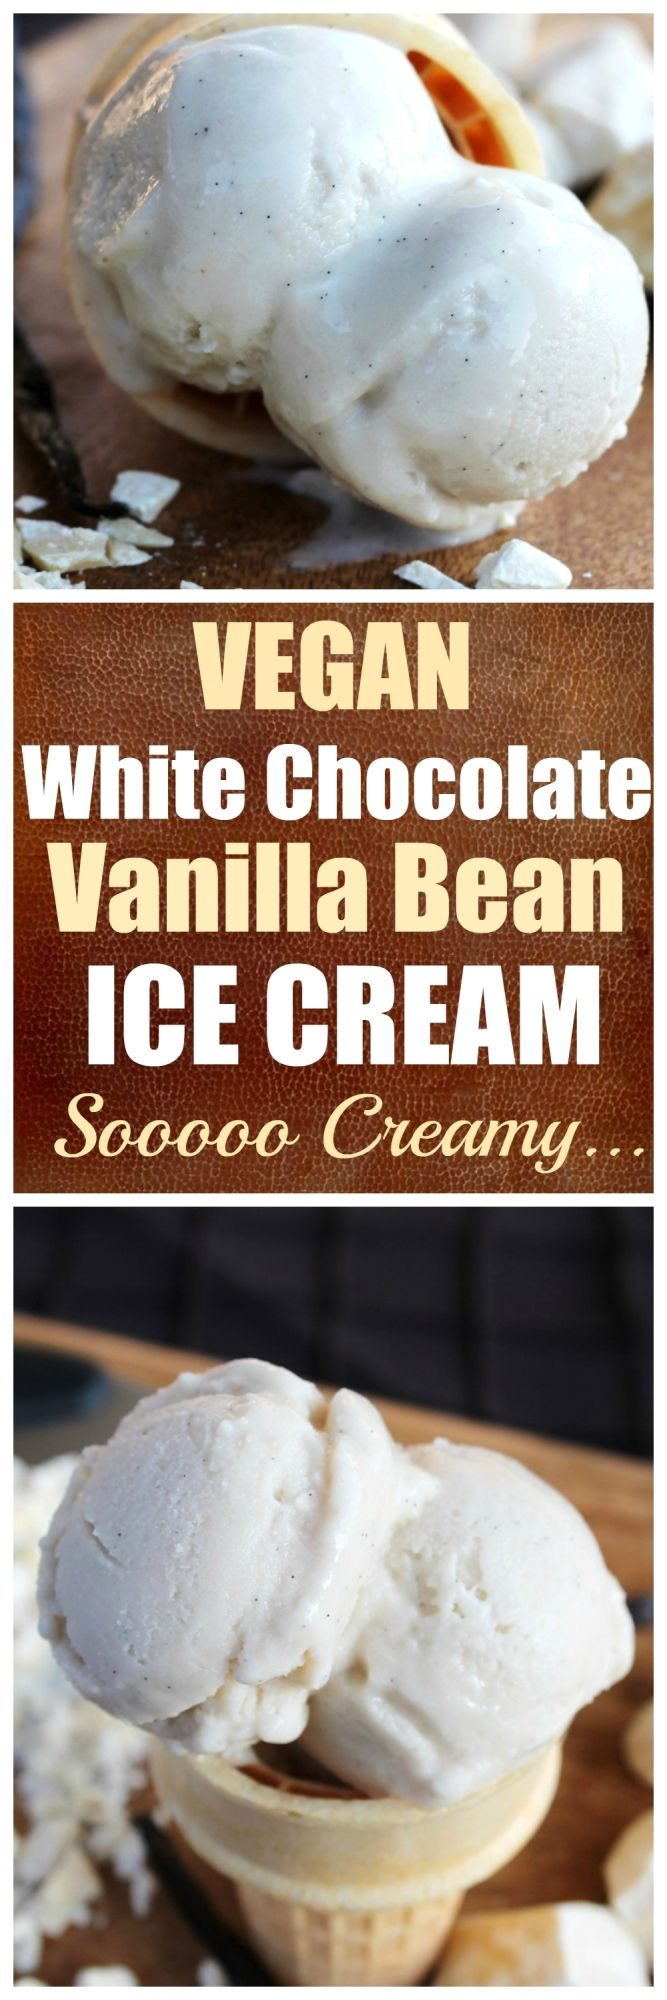 Vegan White Chocolate Vanilla Bean Ice Cream. So creamy, smooth and full of sweet vanilla and white chocolate flavor.